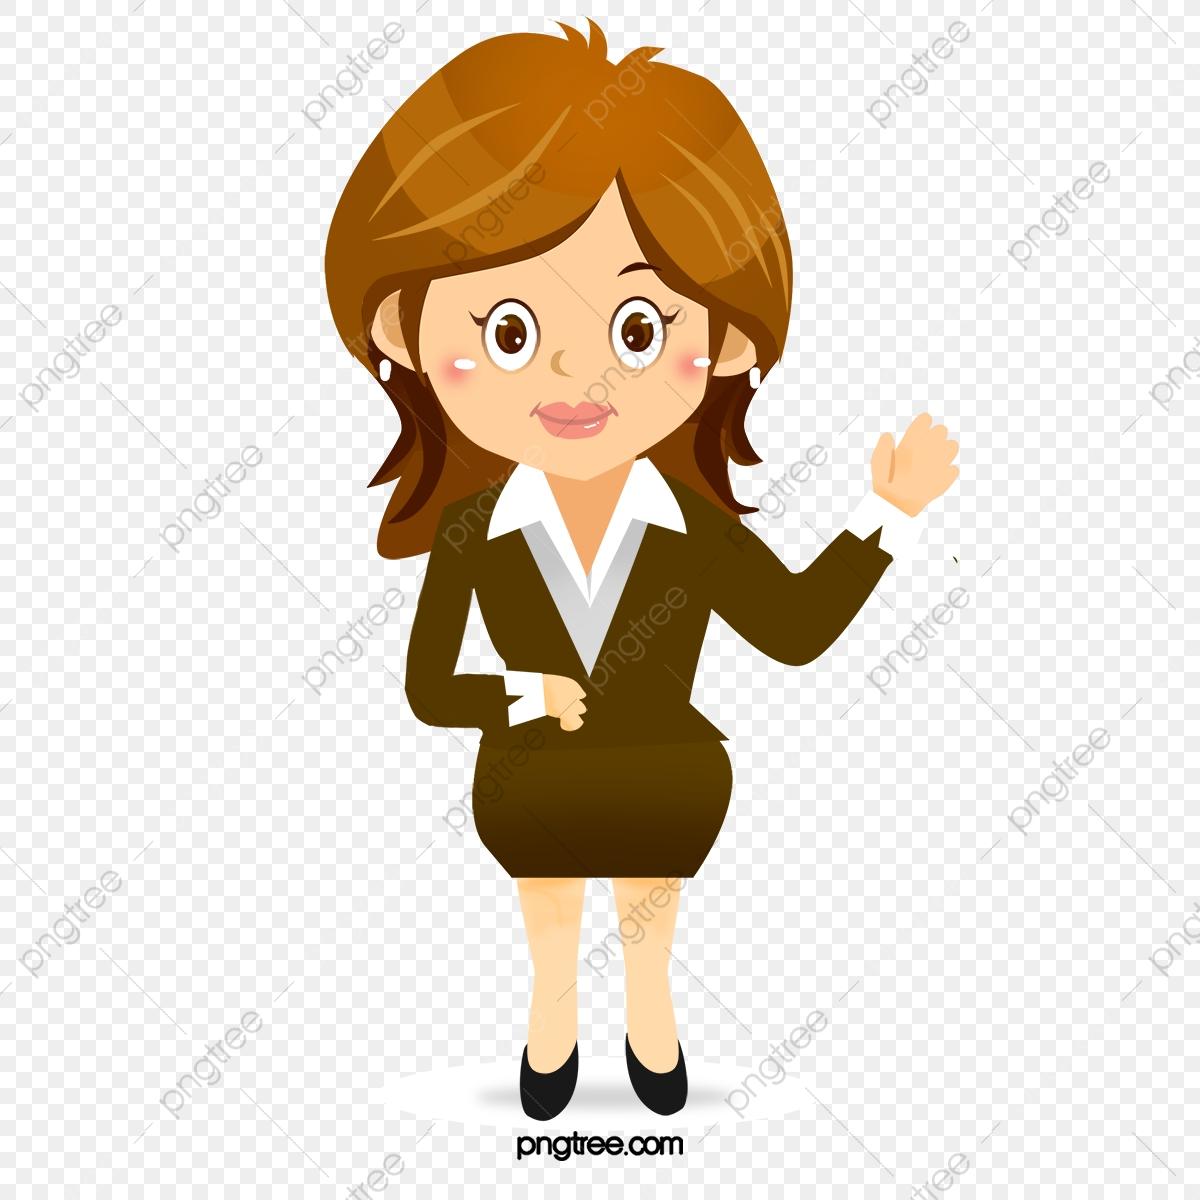 Cartoon Professional Women, Cartoon Clipart, Vector Career Women PNG.